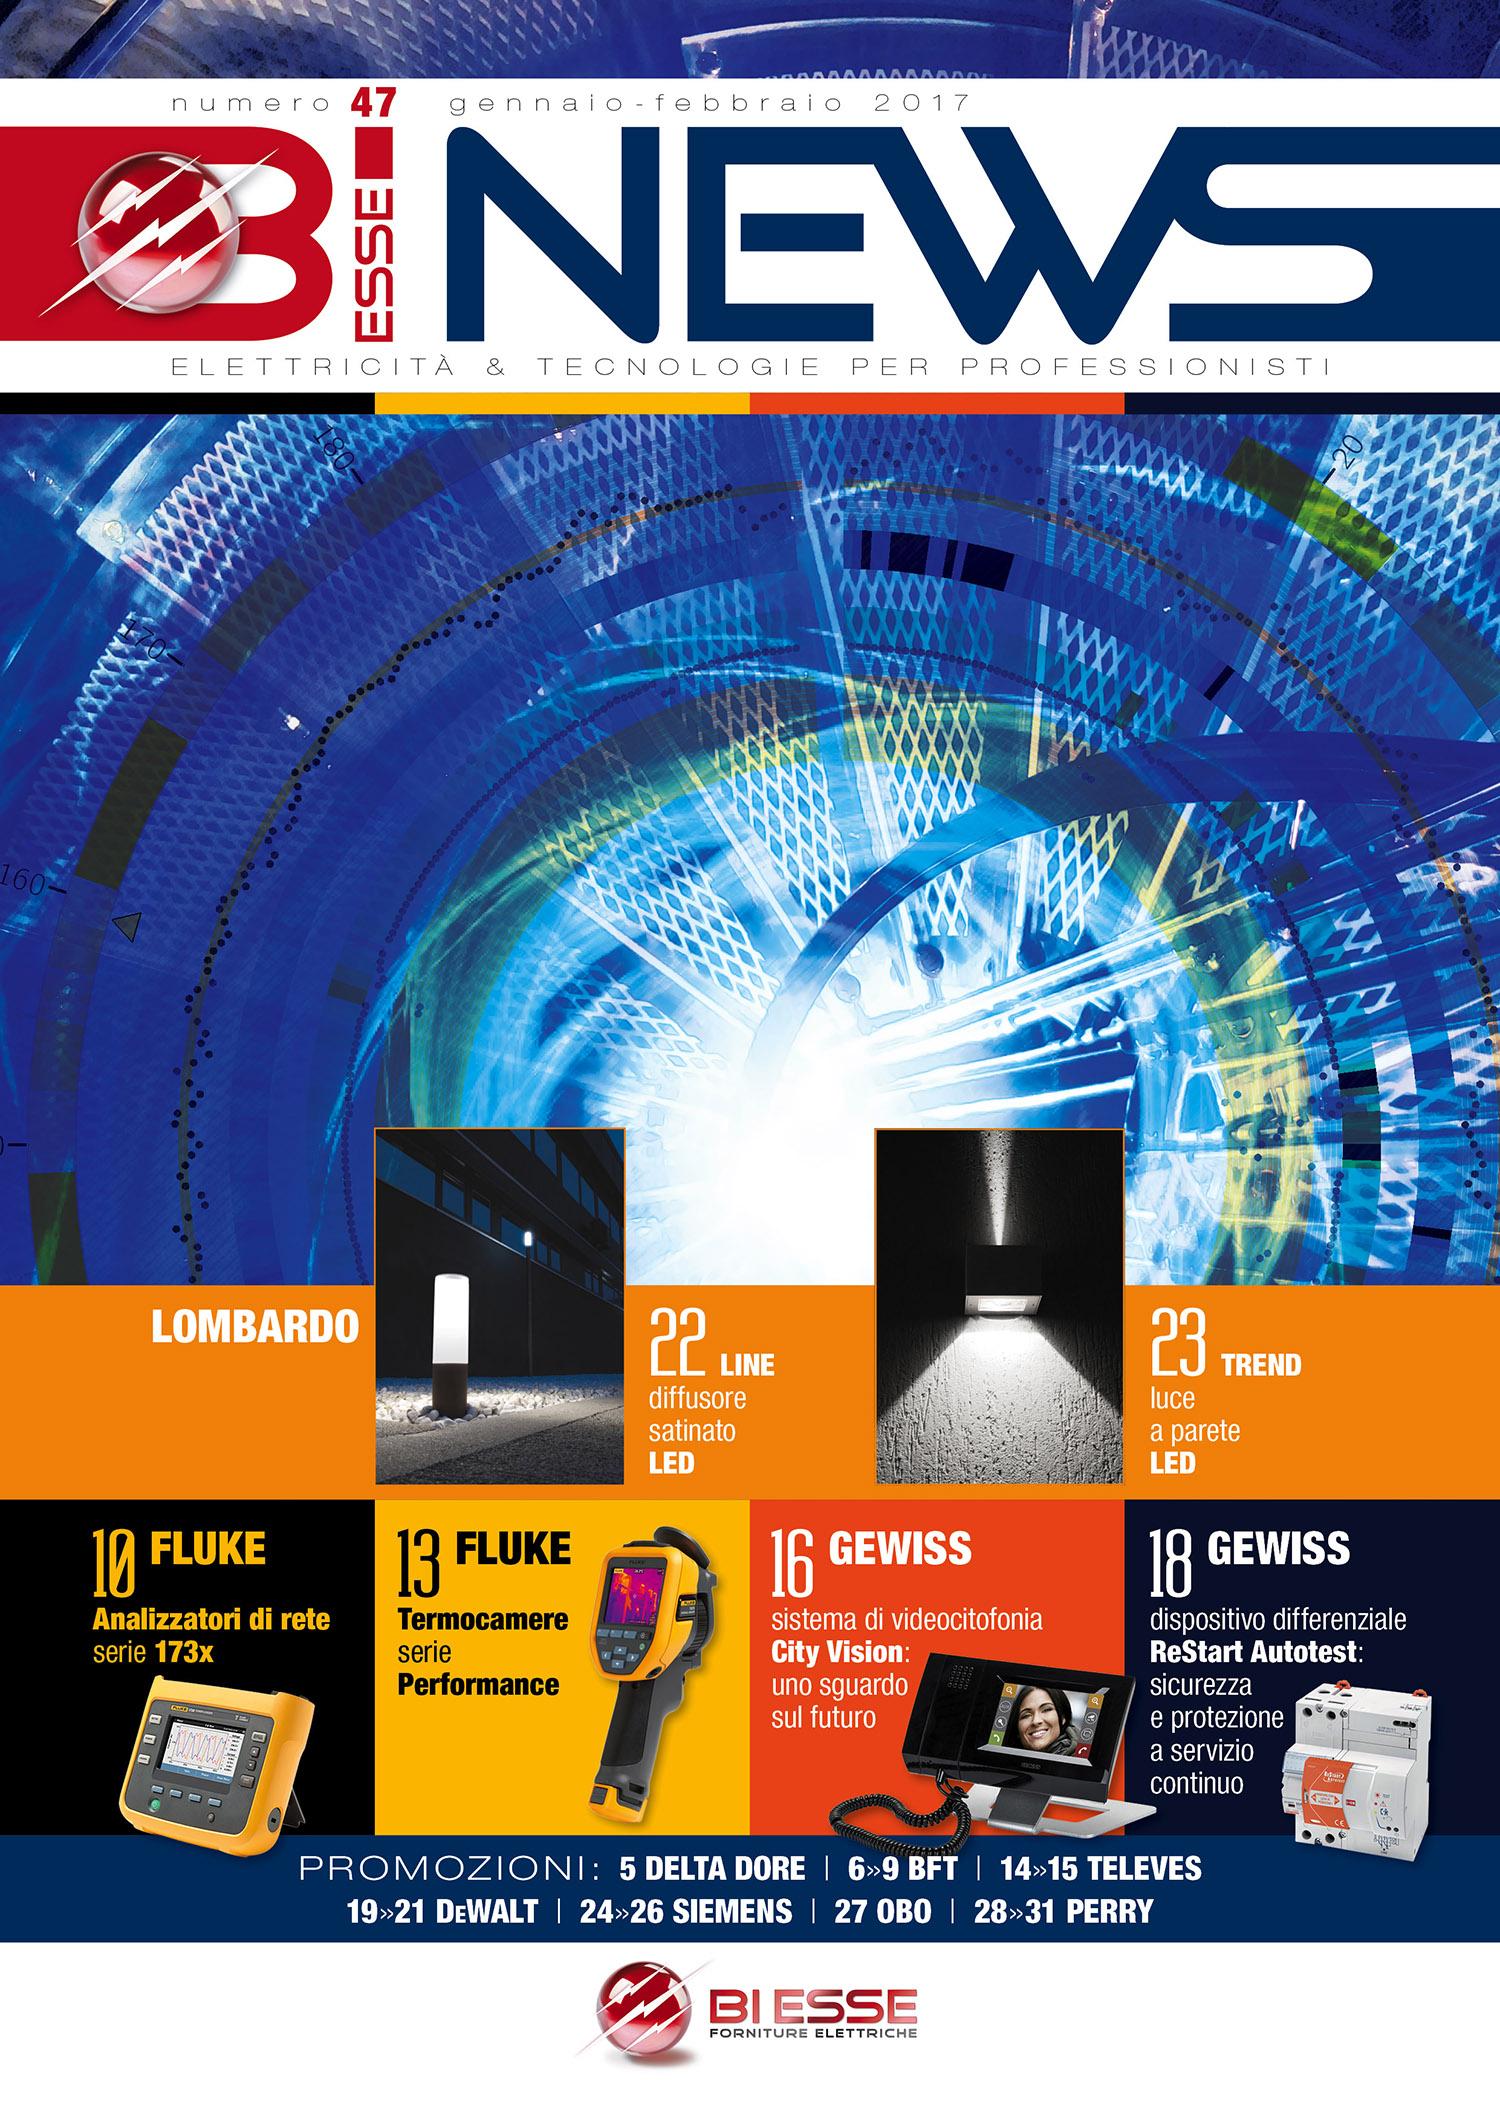 B'News 47